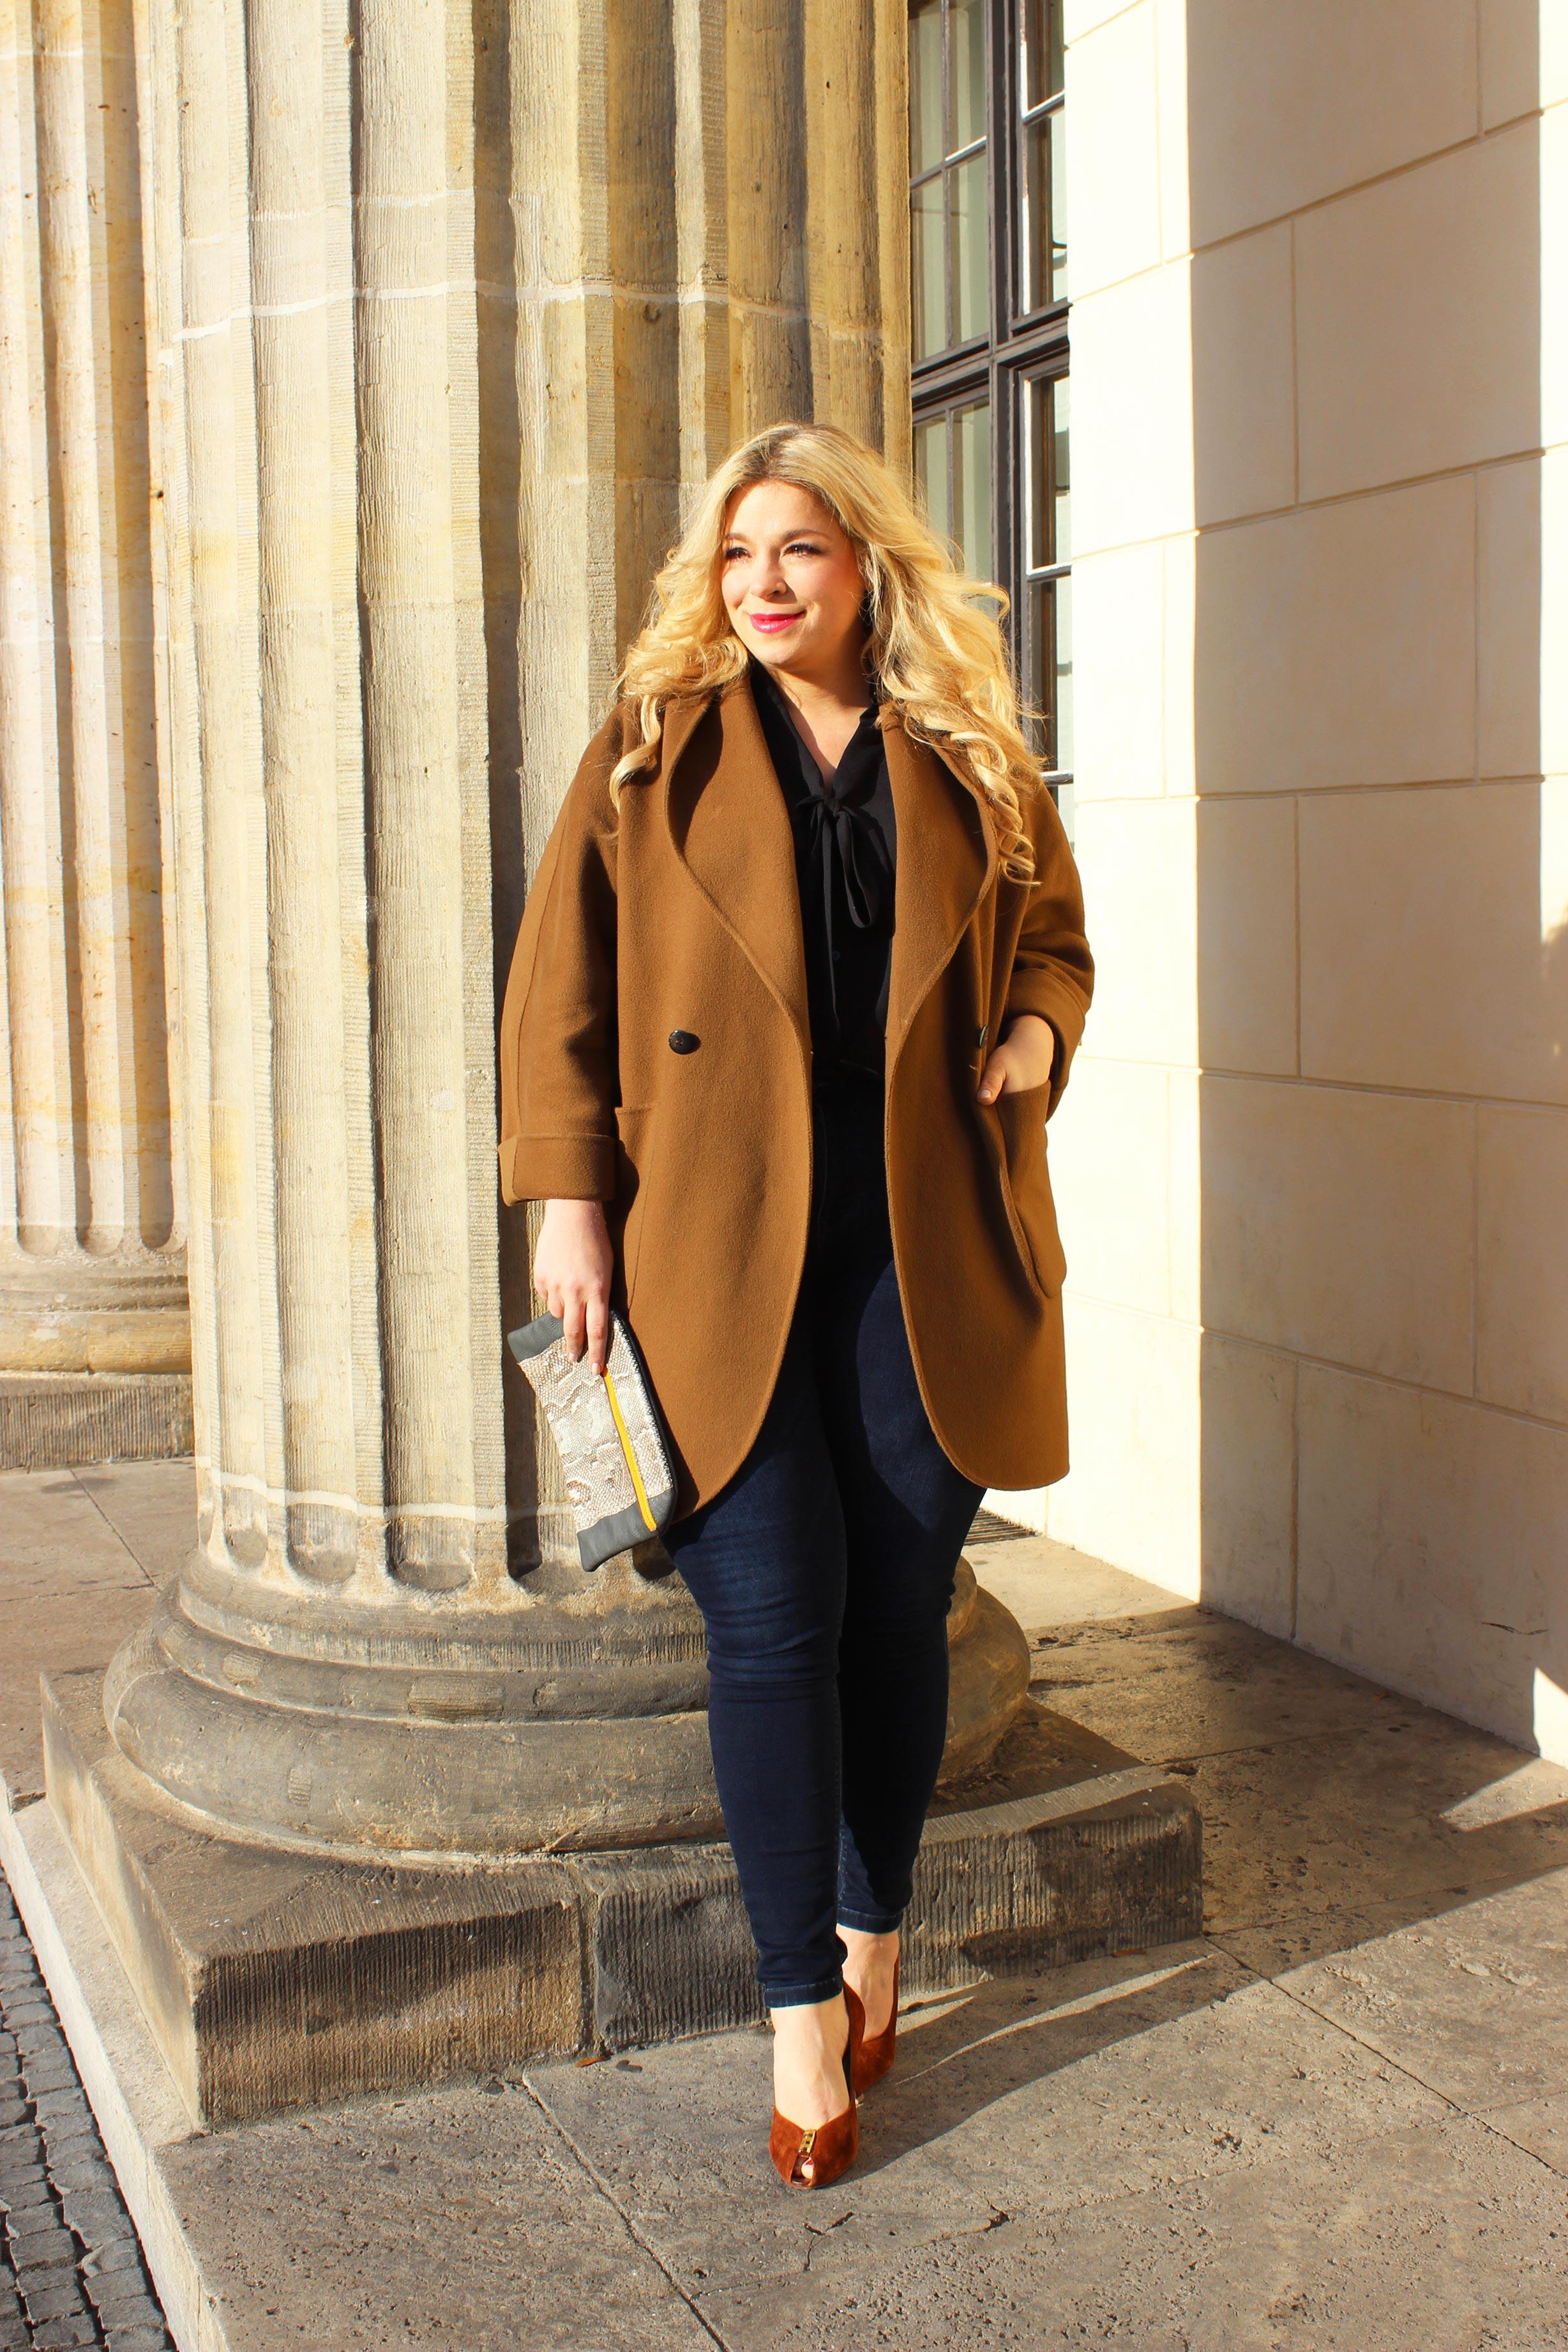 caterina-fashionblogger-megabambi-plussizeblogger-jacke-megabambi-caterina-megabambi-caterina-plussize-curvy-Marina-rinaldi-outfit-blogger